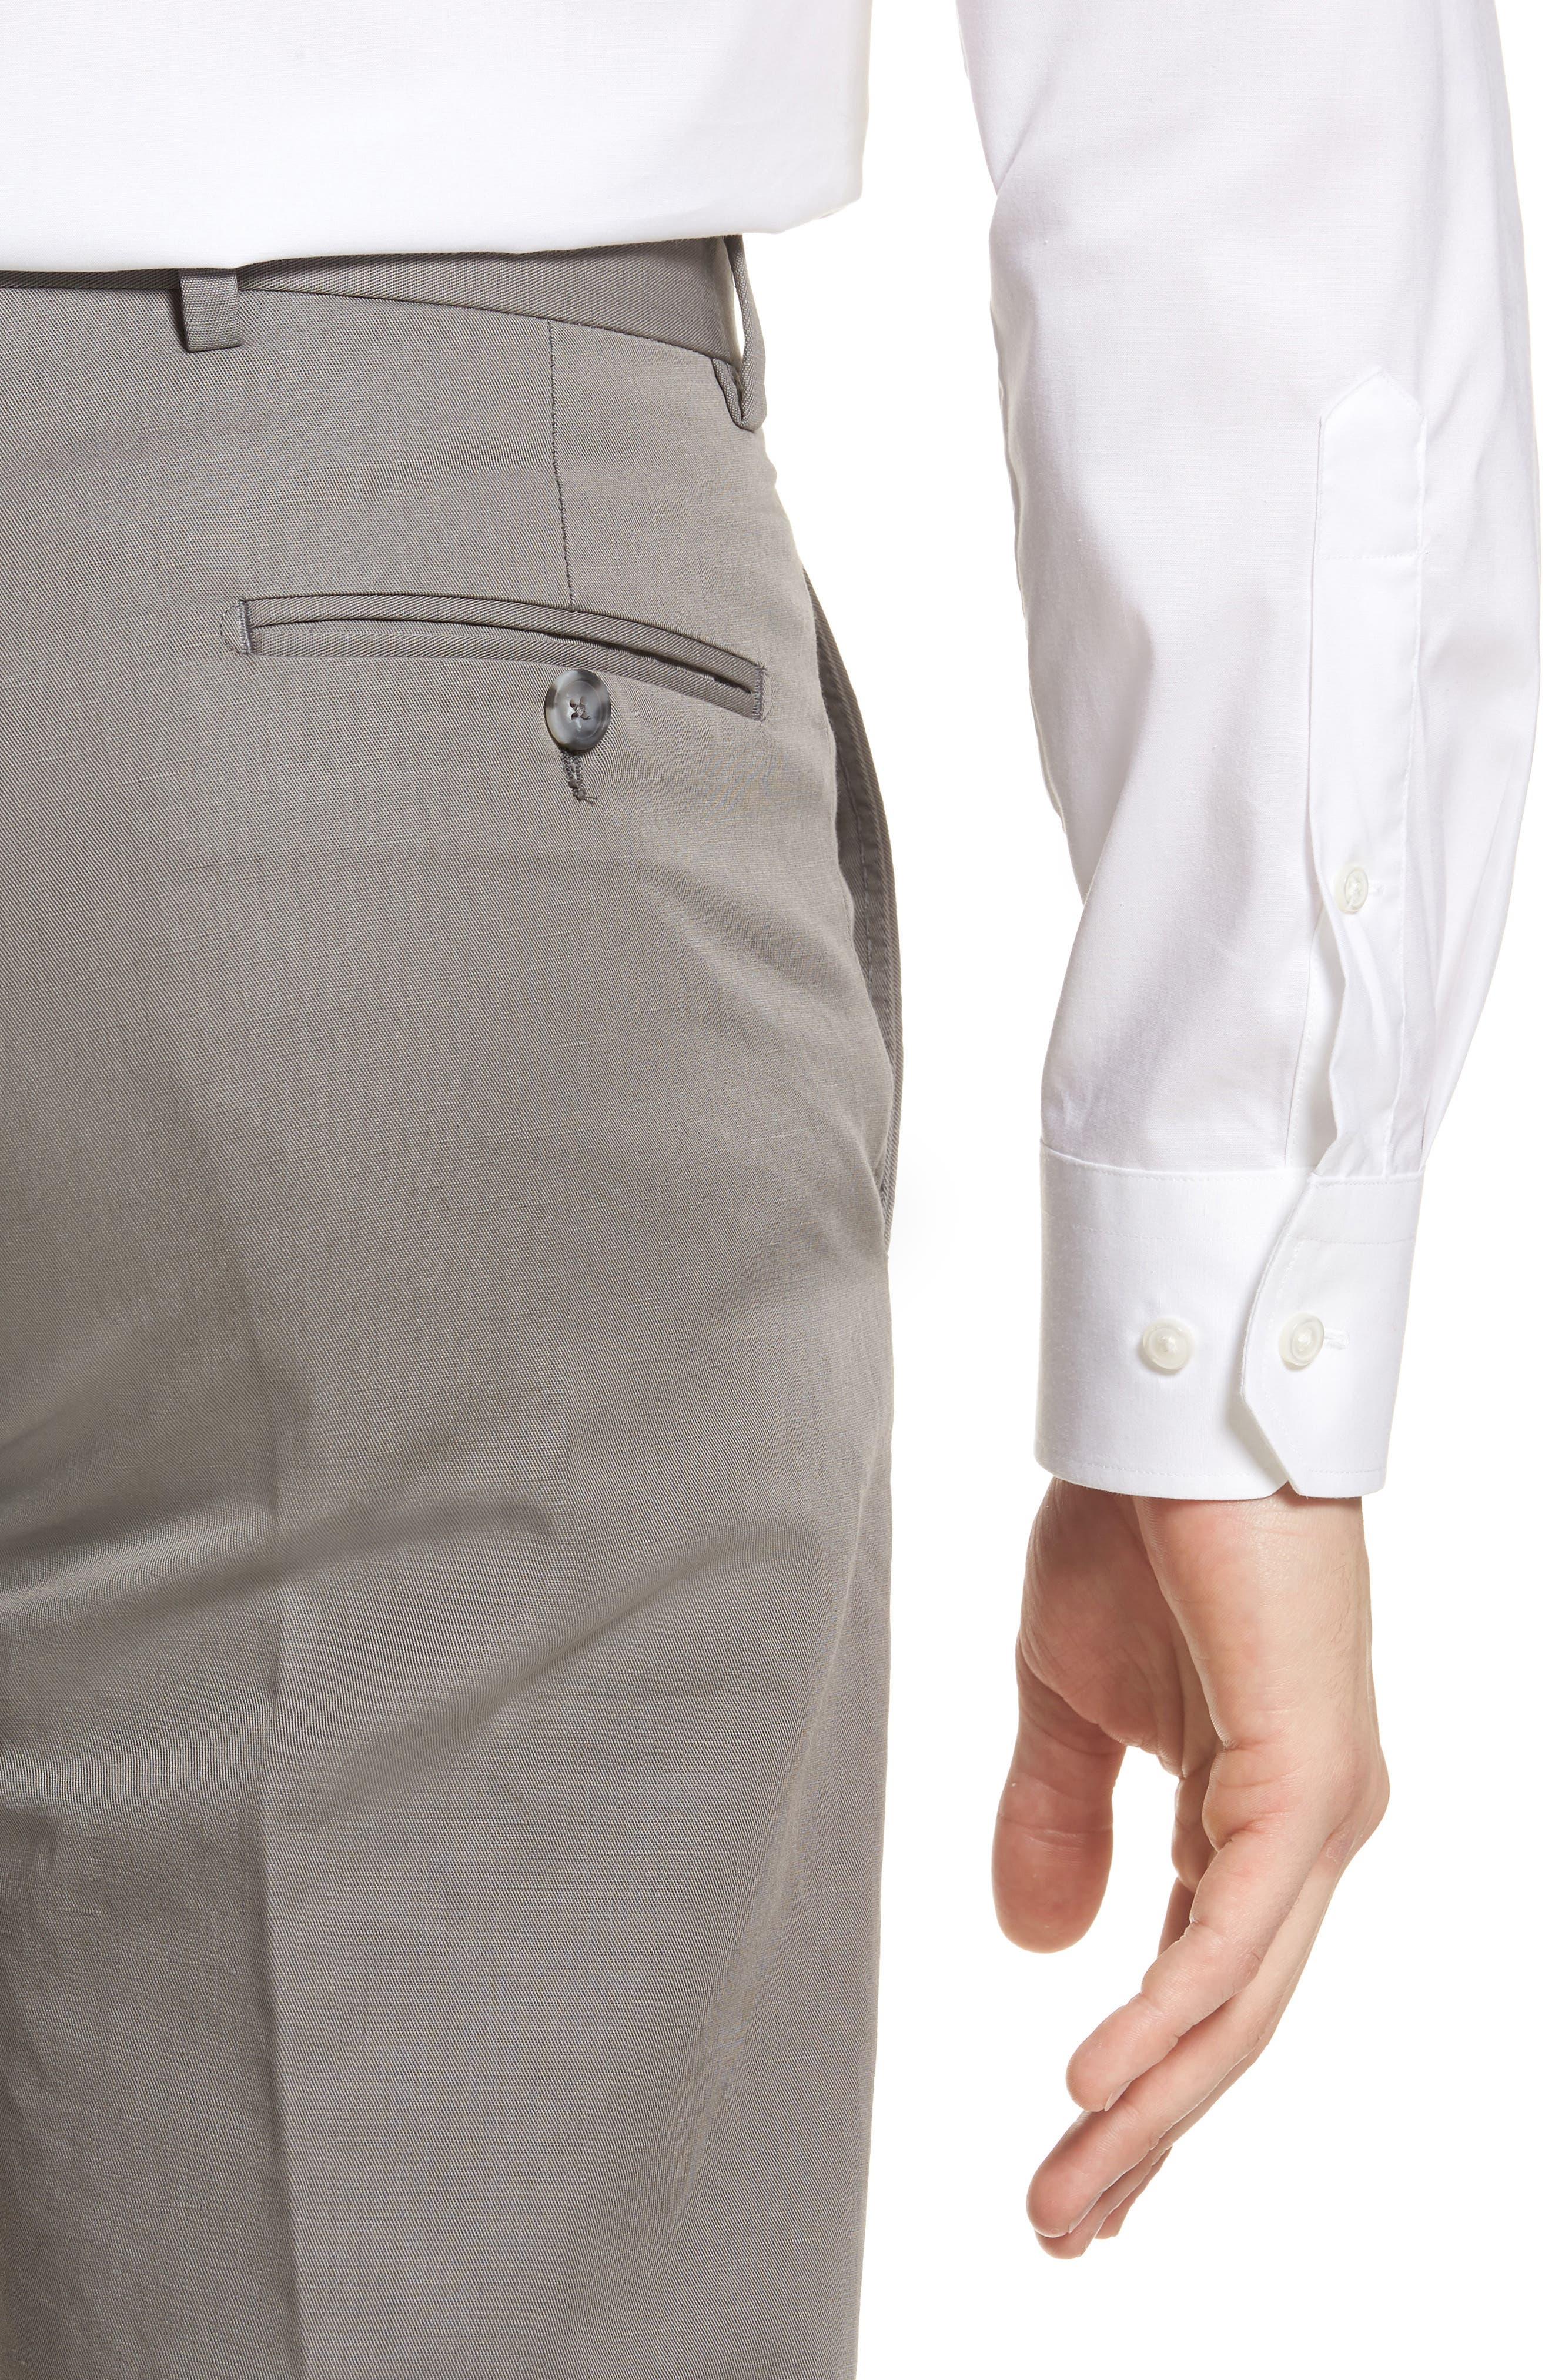 Flat Front Solid Cotton & Linen Trousers,                             Alternate thumbnail 5, color,                             030